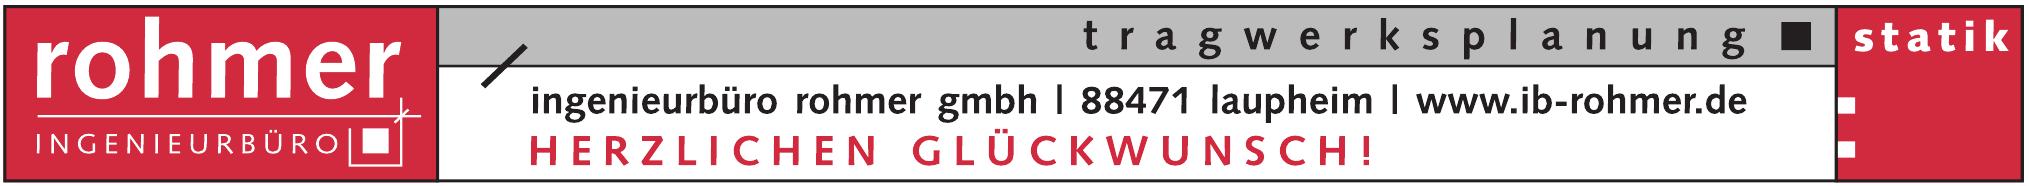 Ingenieurbüro Rohmer GmbH